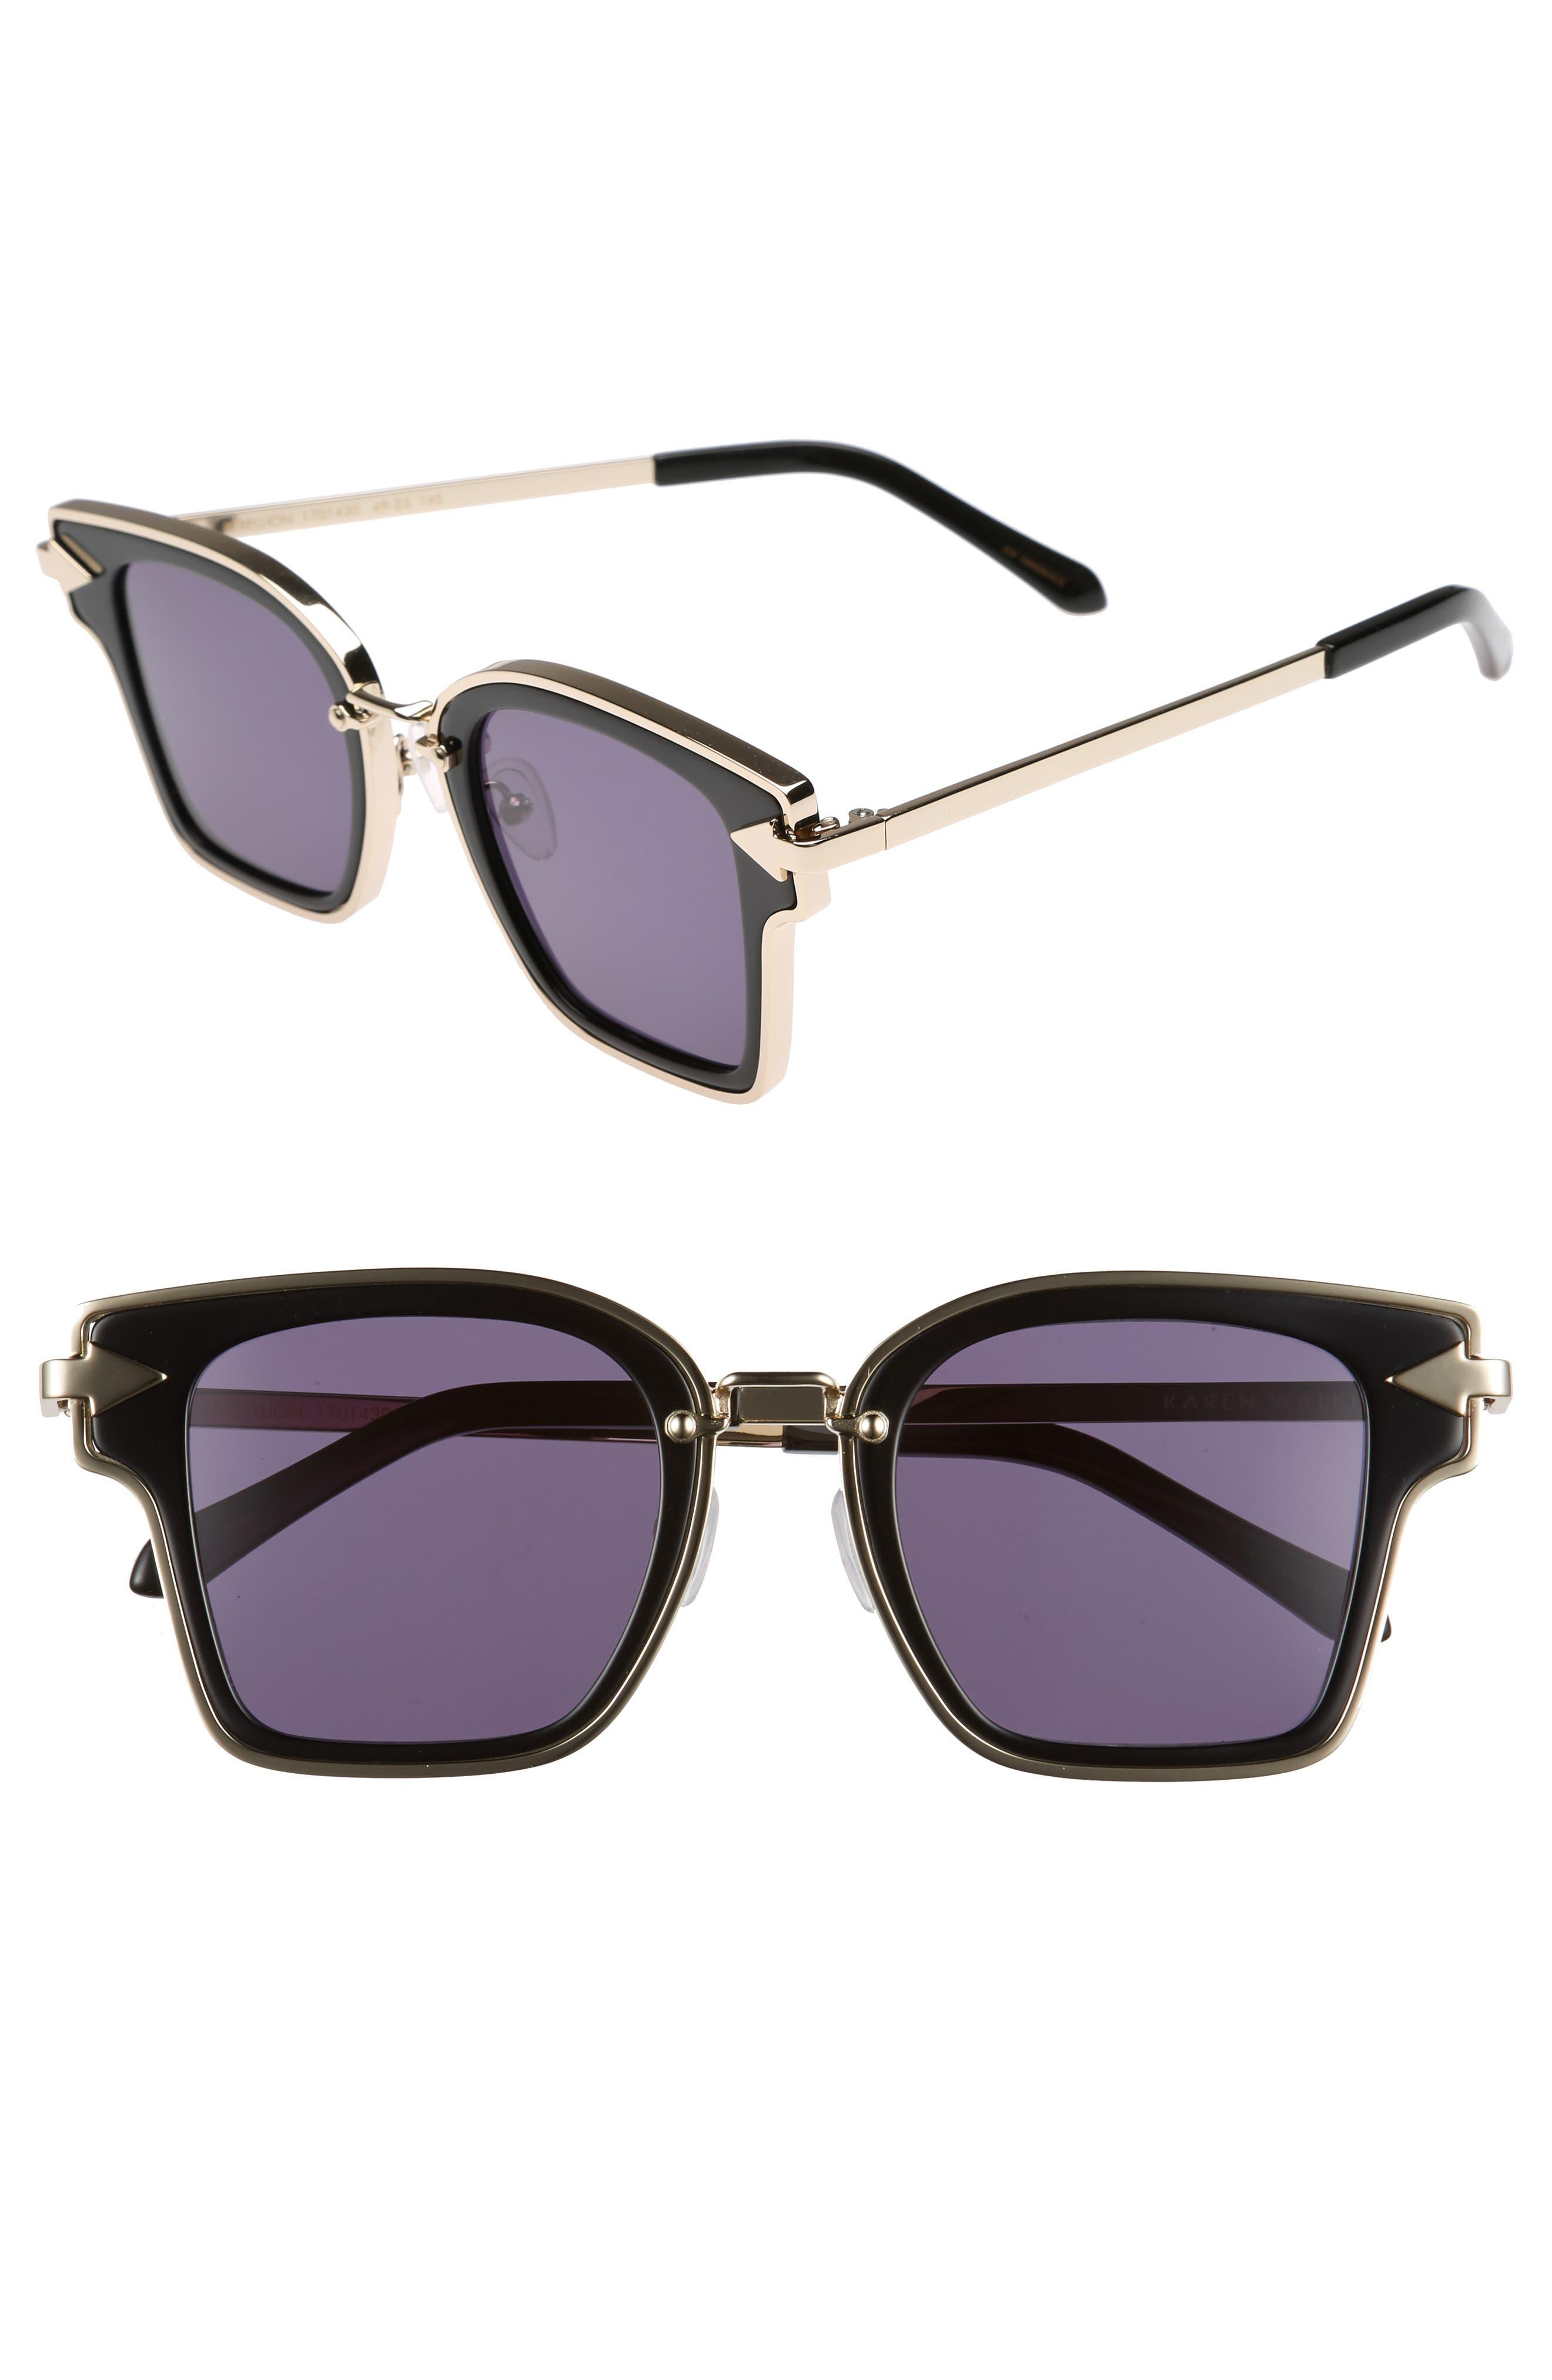 Rebellion 49mm Sunglasses,                             Main thumbnail 1, color,                             001